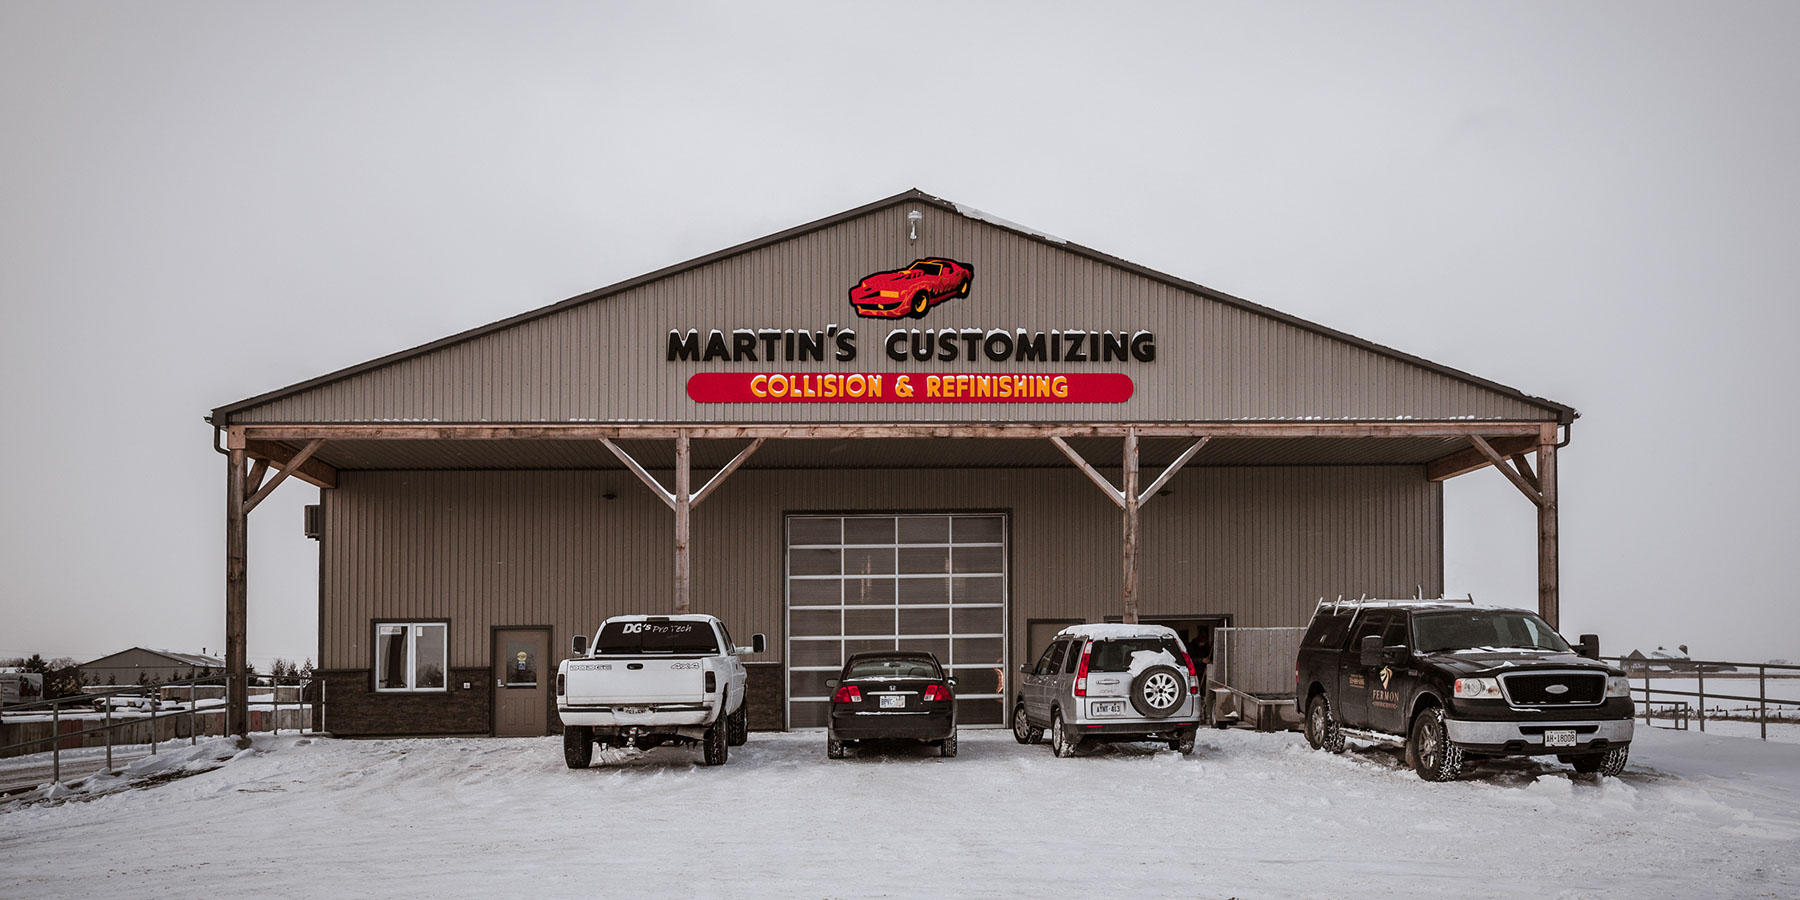 Martins Auto Repair >> Martins Customizing Martin S Customizing